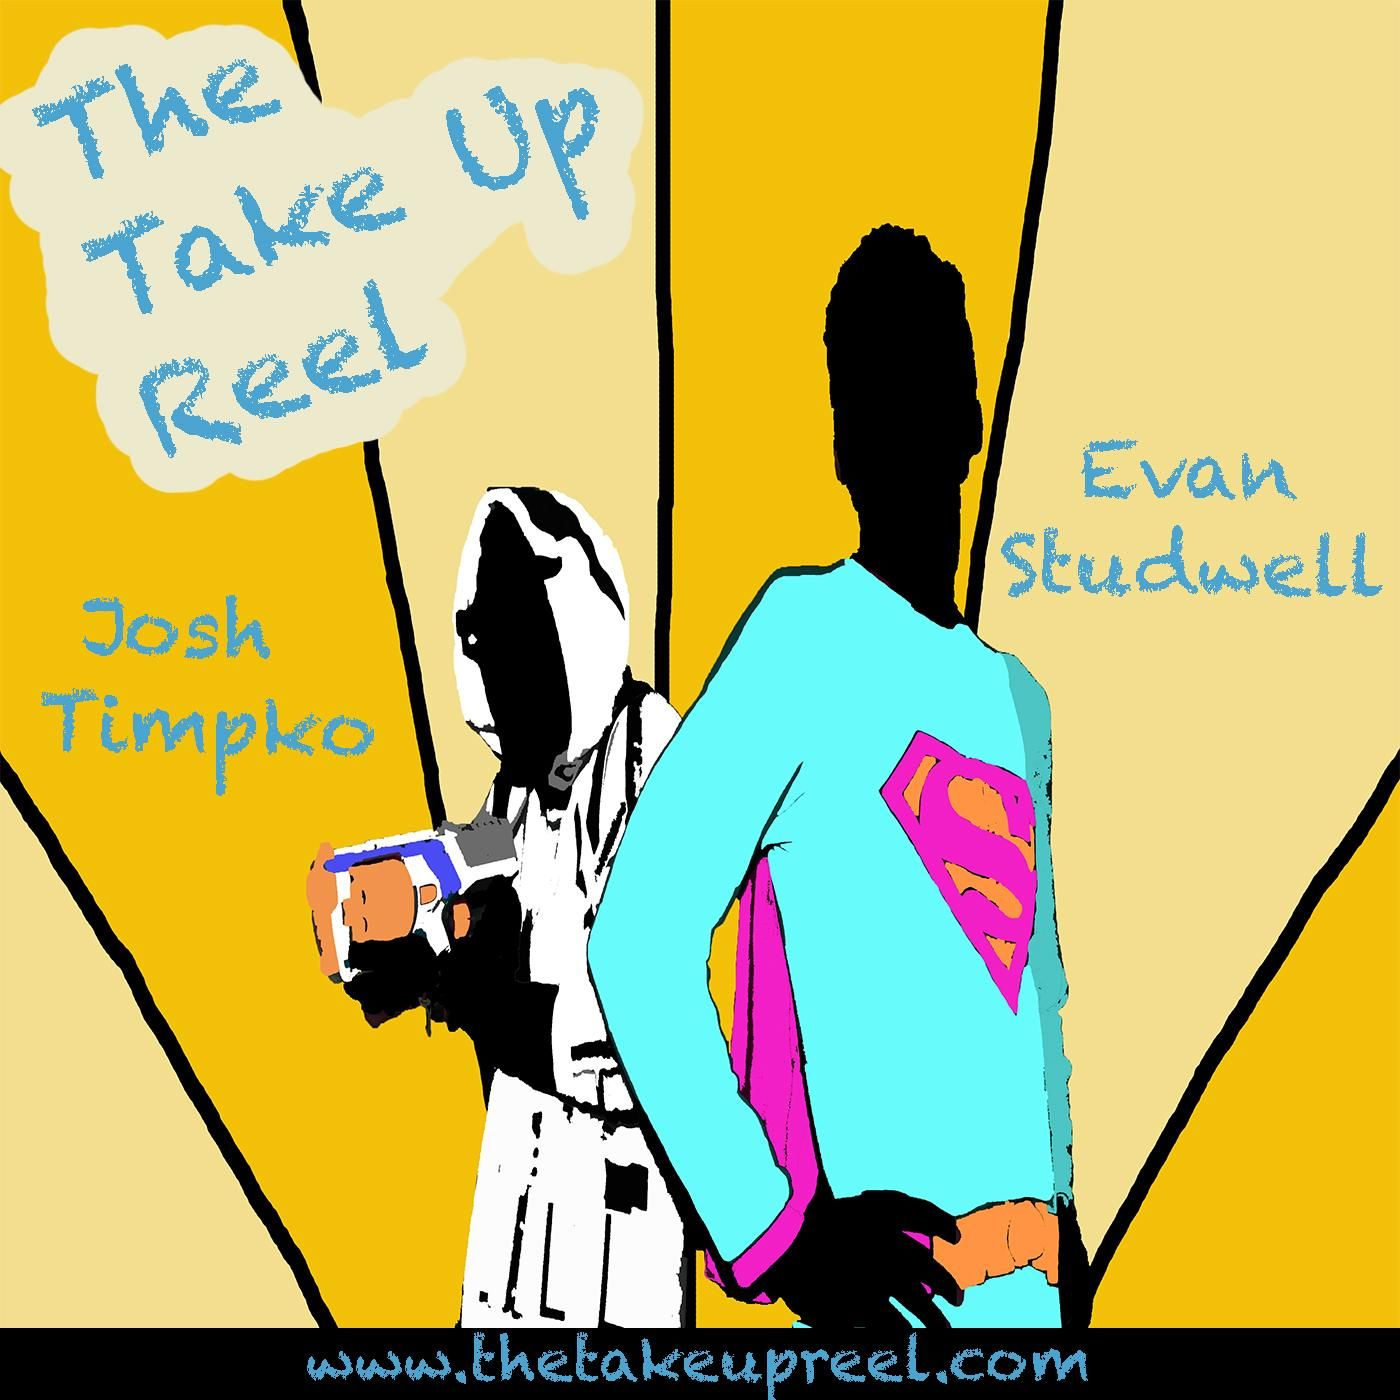 Ep. 040: Is Film School Worth It? (Goodbye Evan and Josh)